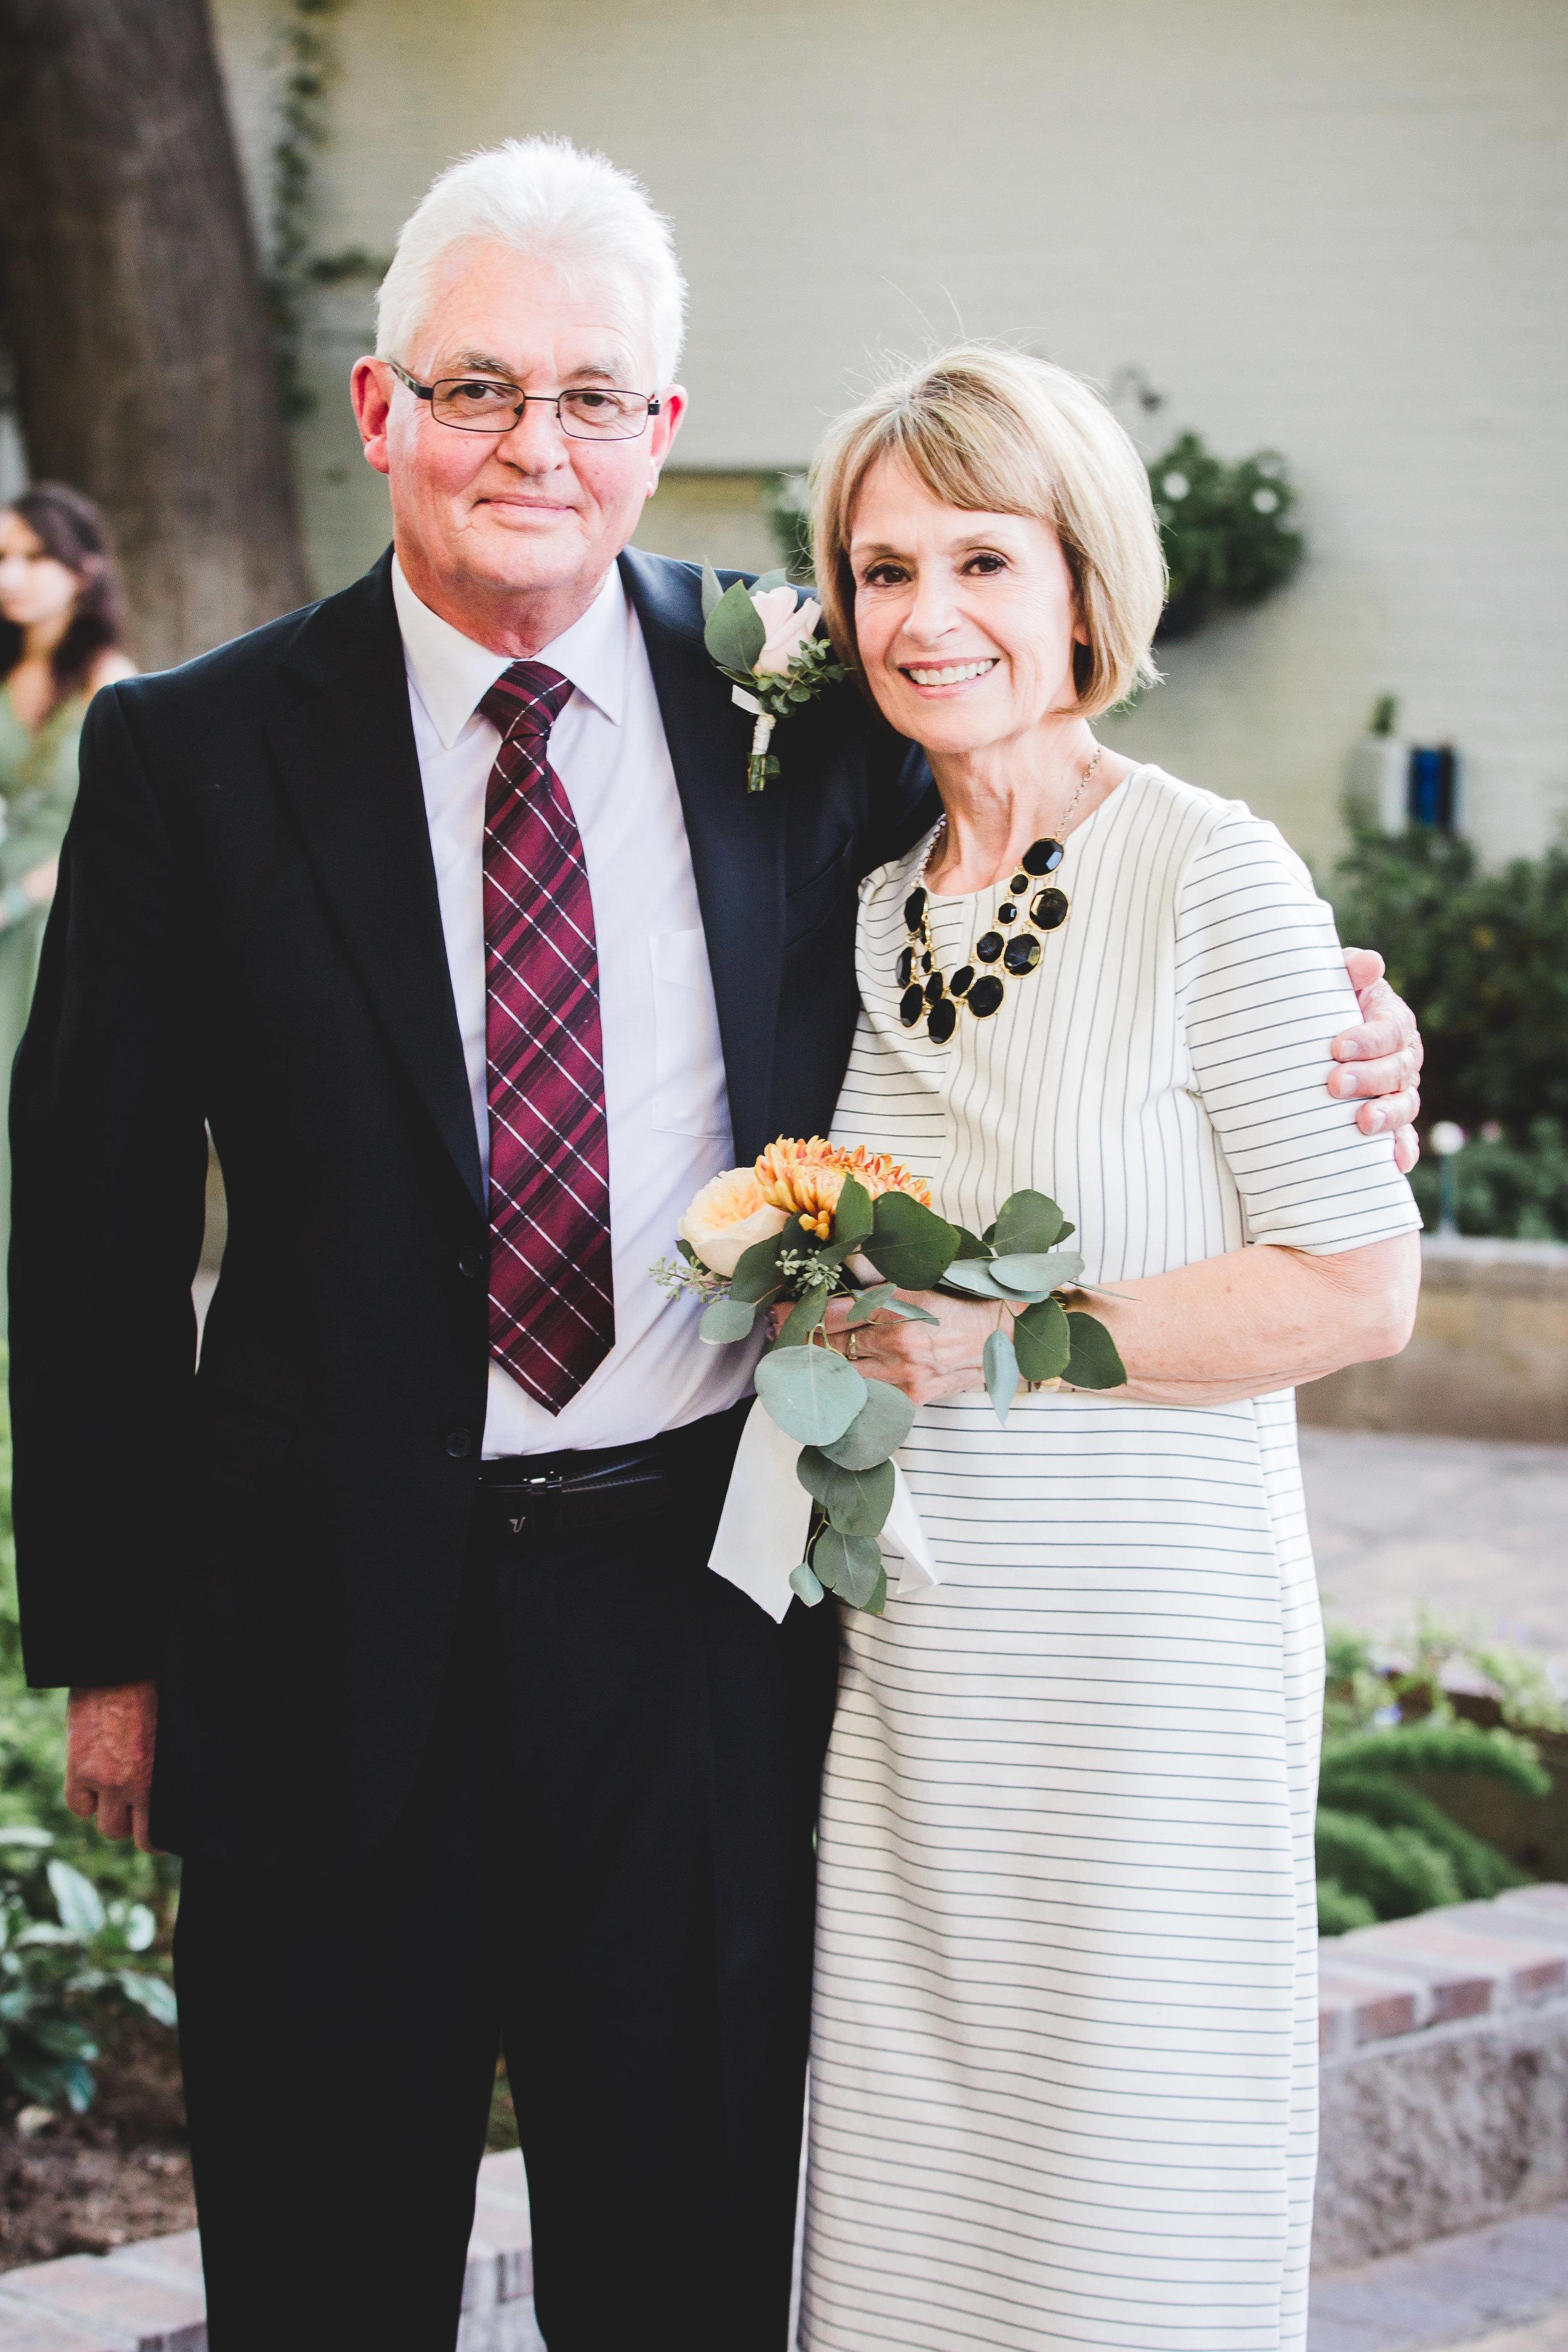 2018-09-07-WEDDING-MCBRIDE-TERRY-119.jpg